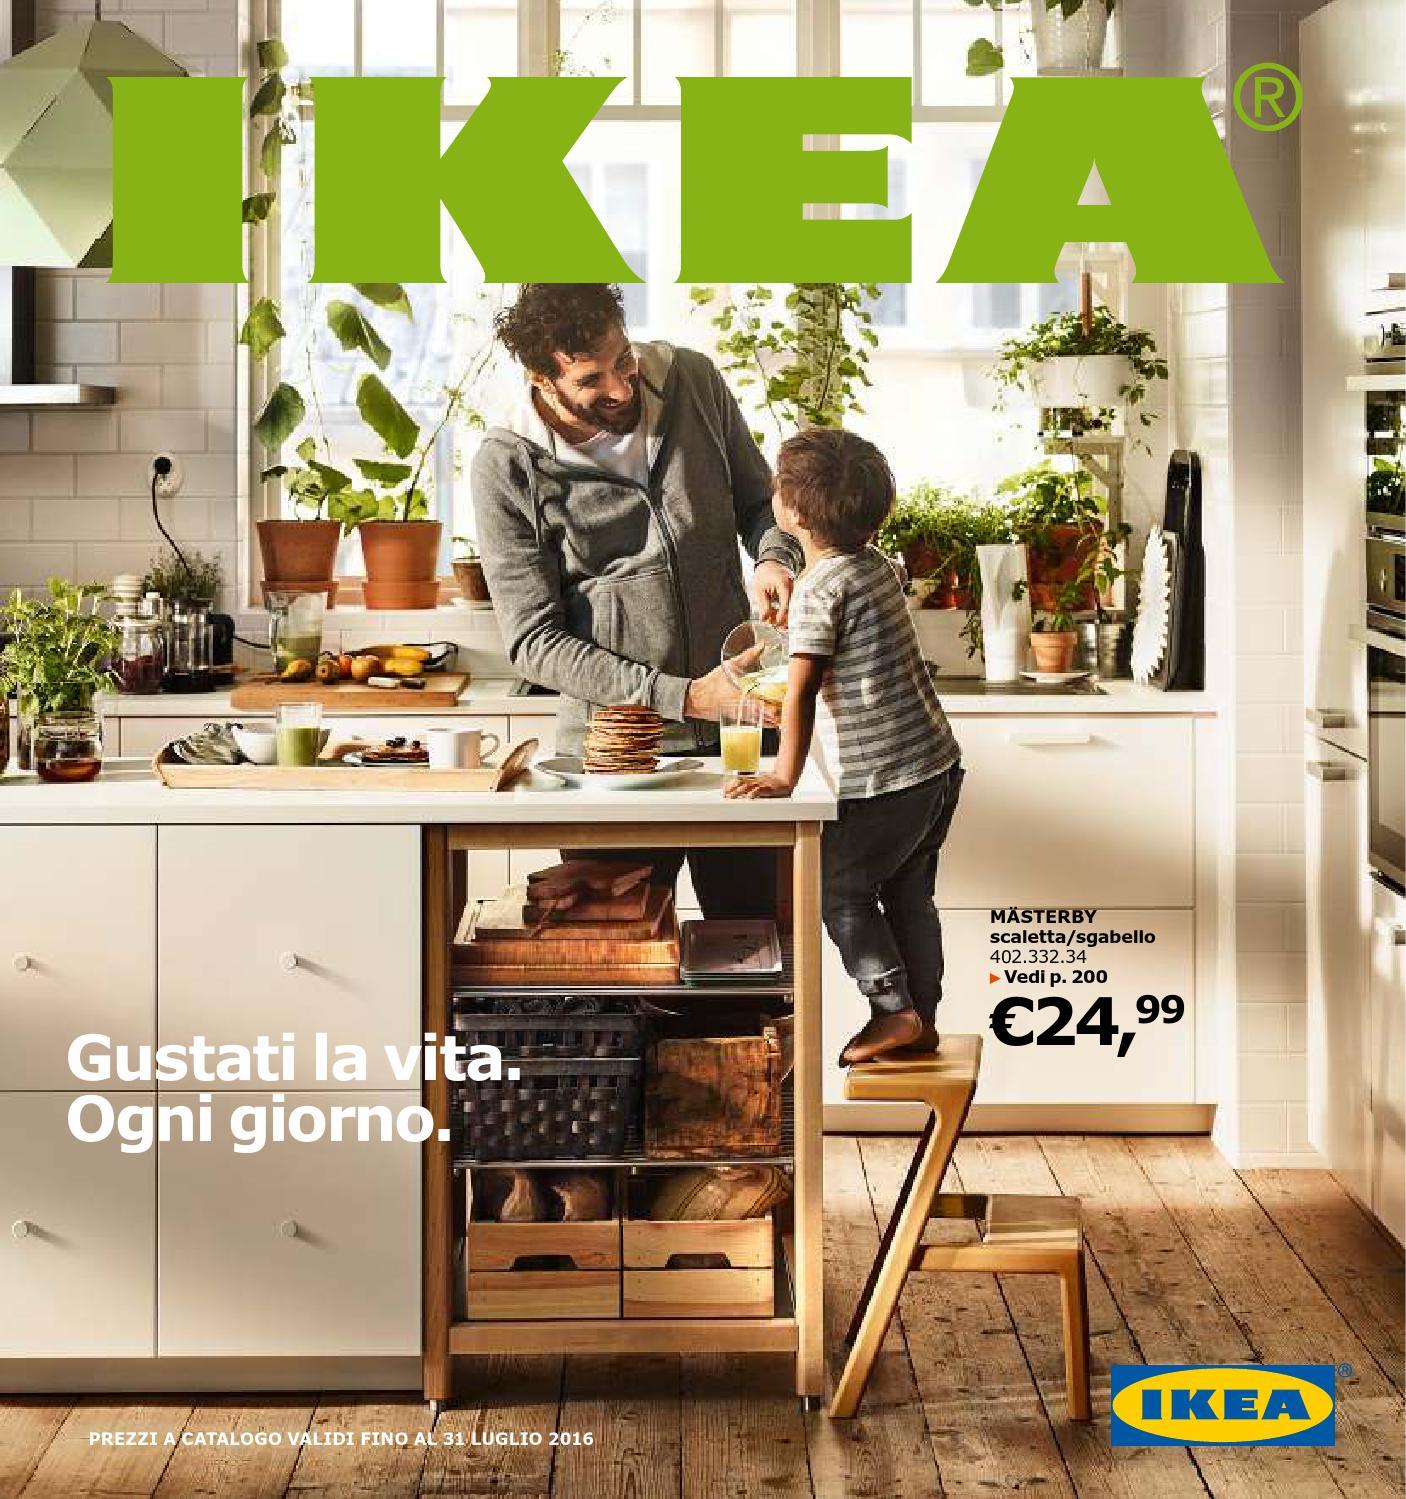 Tavolino Per Mangiare A Letto Ikea.Ikea 31lug By Volavolantino Issuu